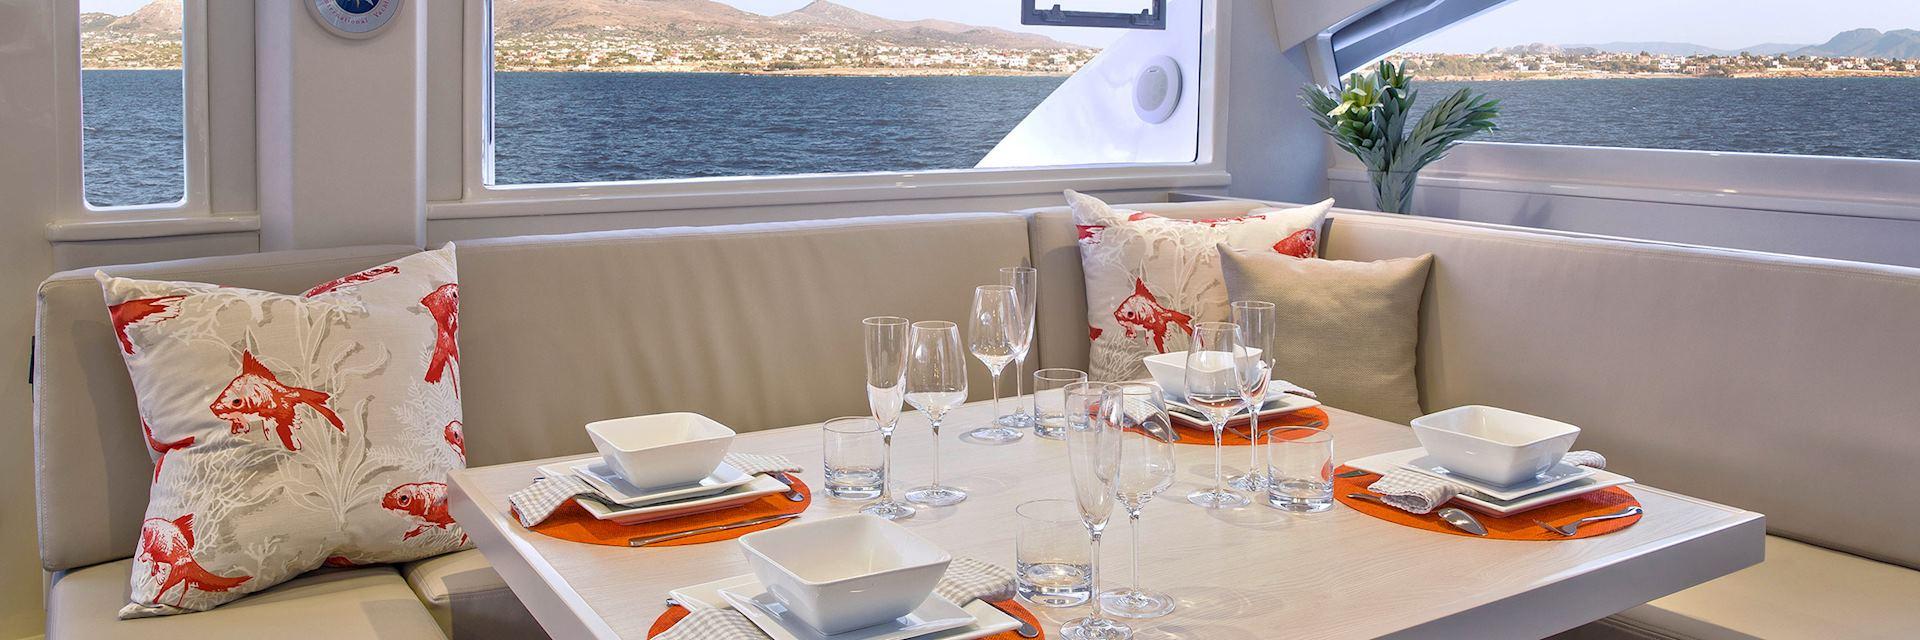 The Moorings 4800 Sail Catamaran, Saint Lucia